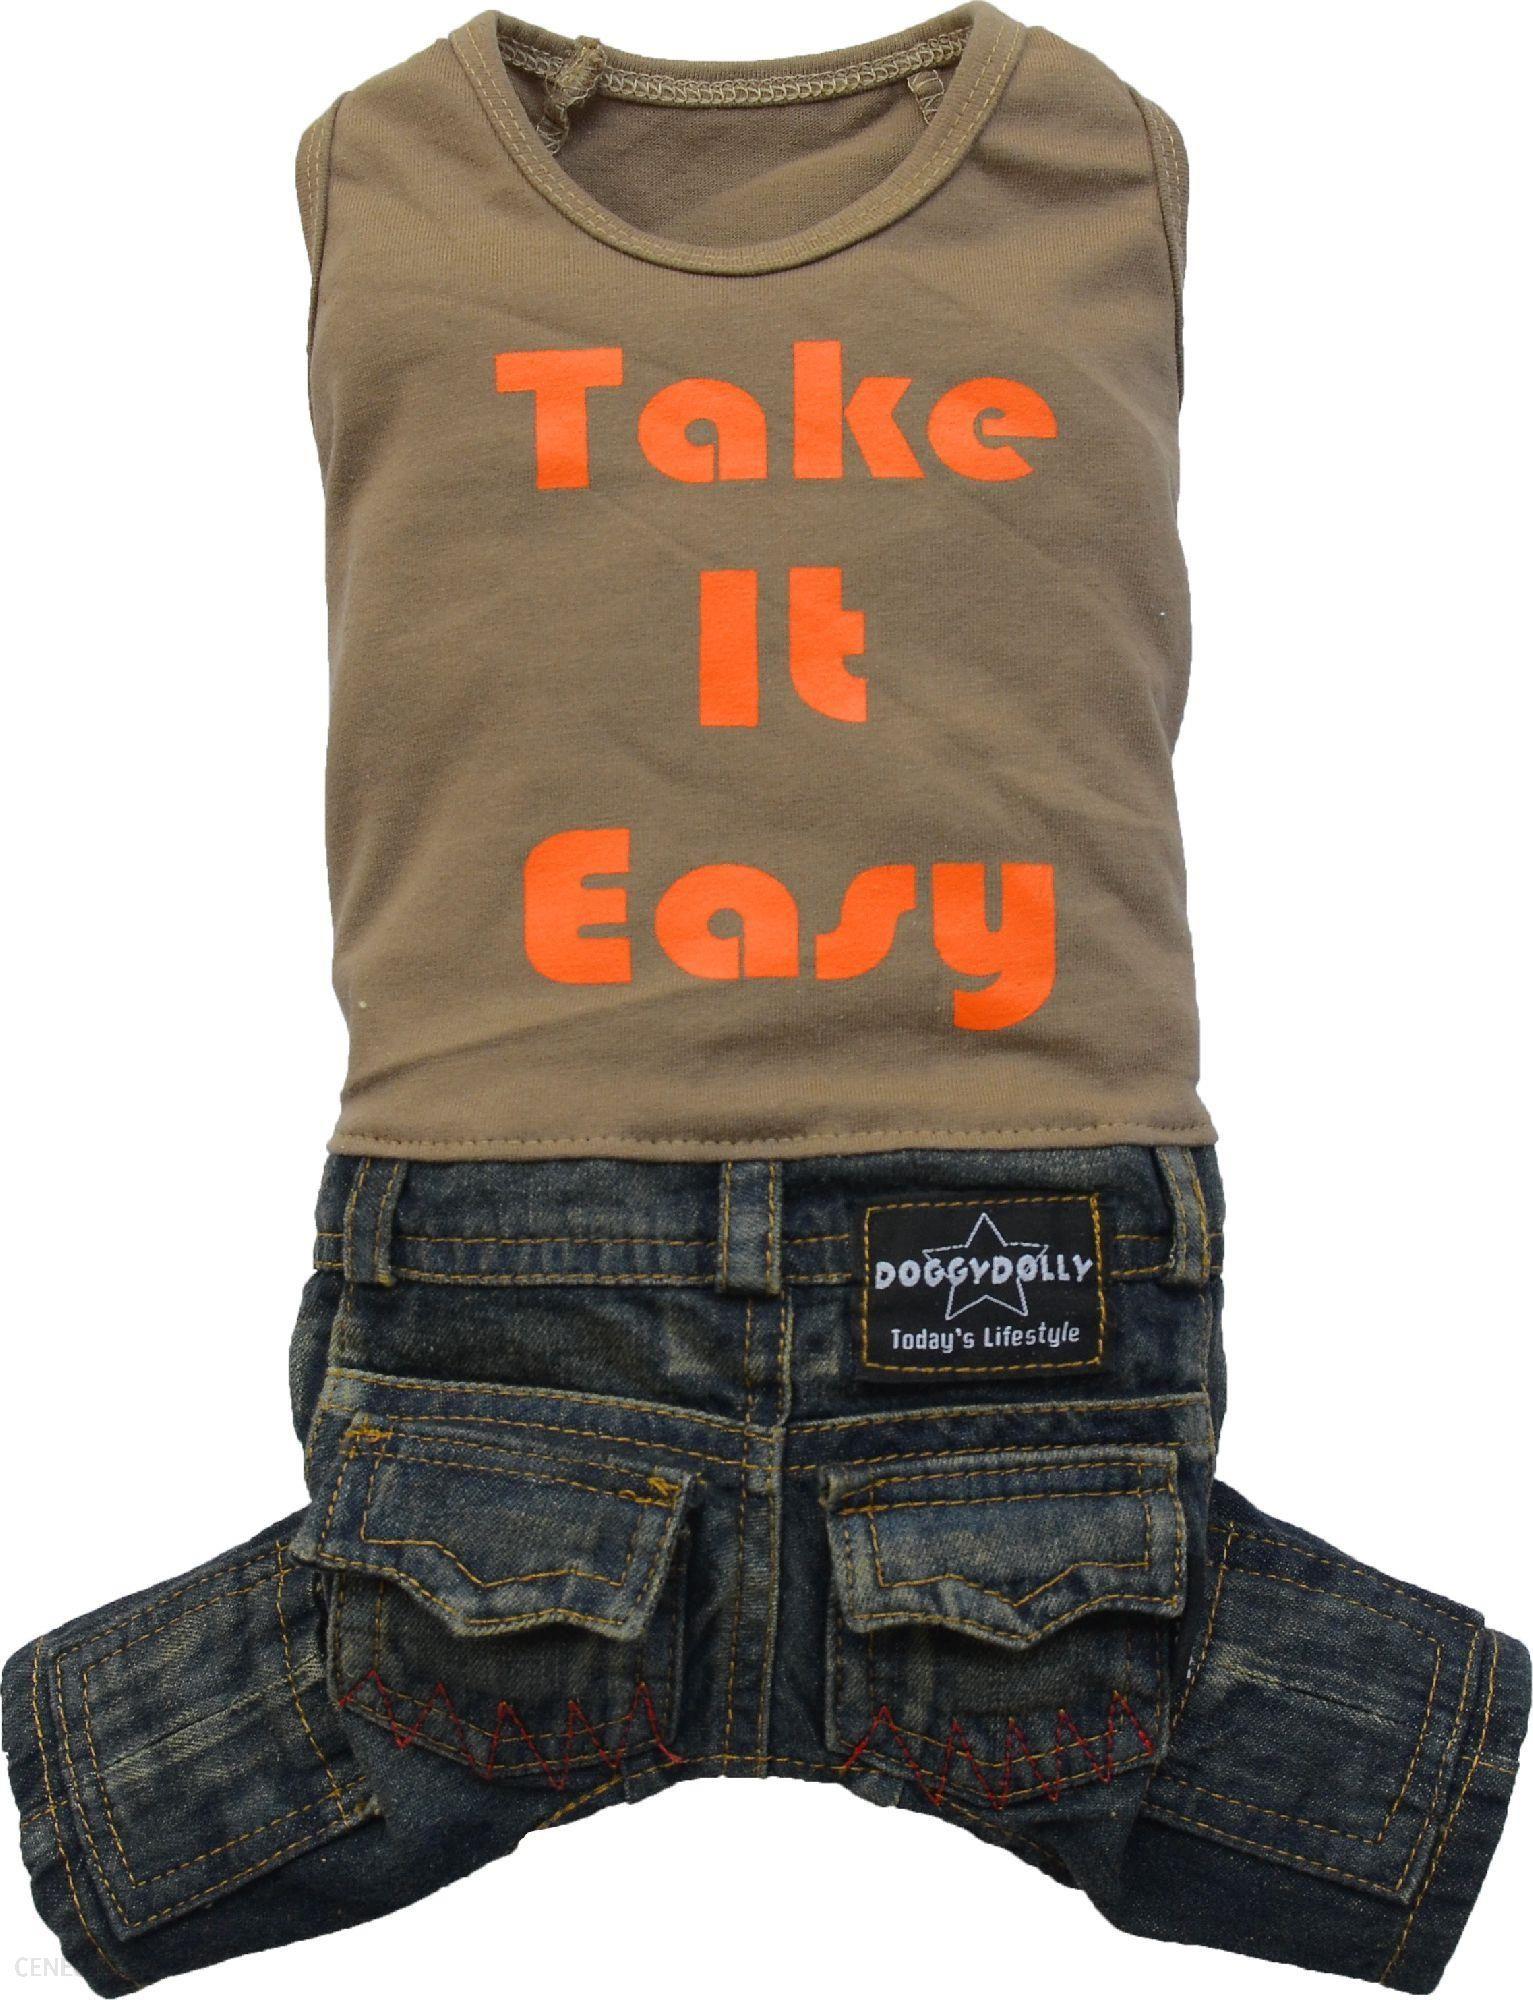 Doggydolly Komplet Jeans Z T-Shirtem Brązowy M 28-30Cm/41-43Cm